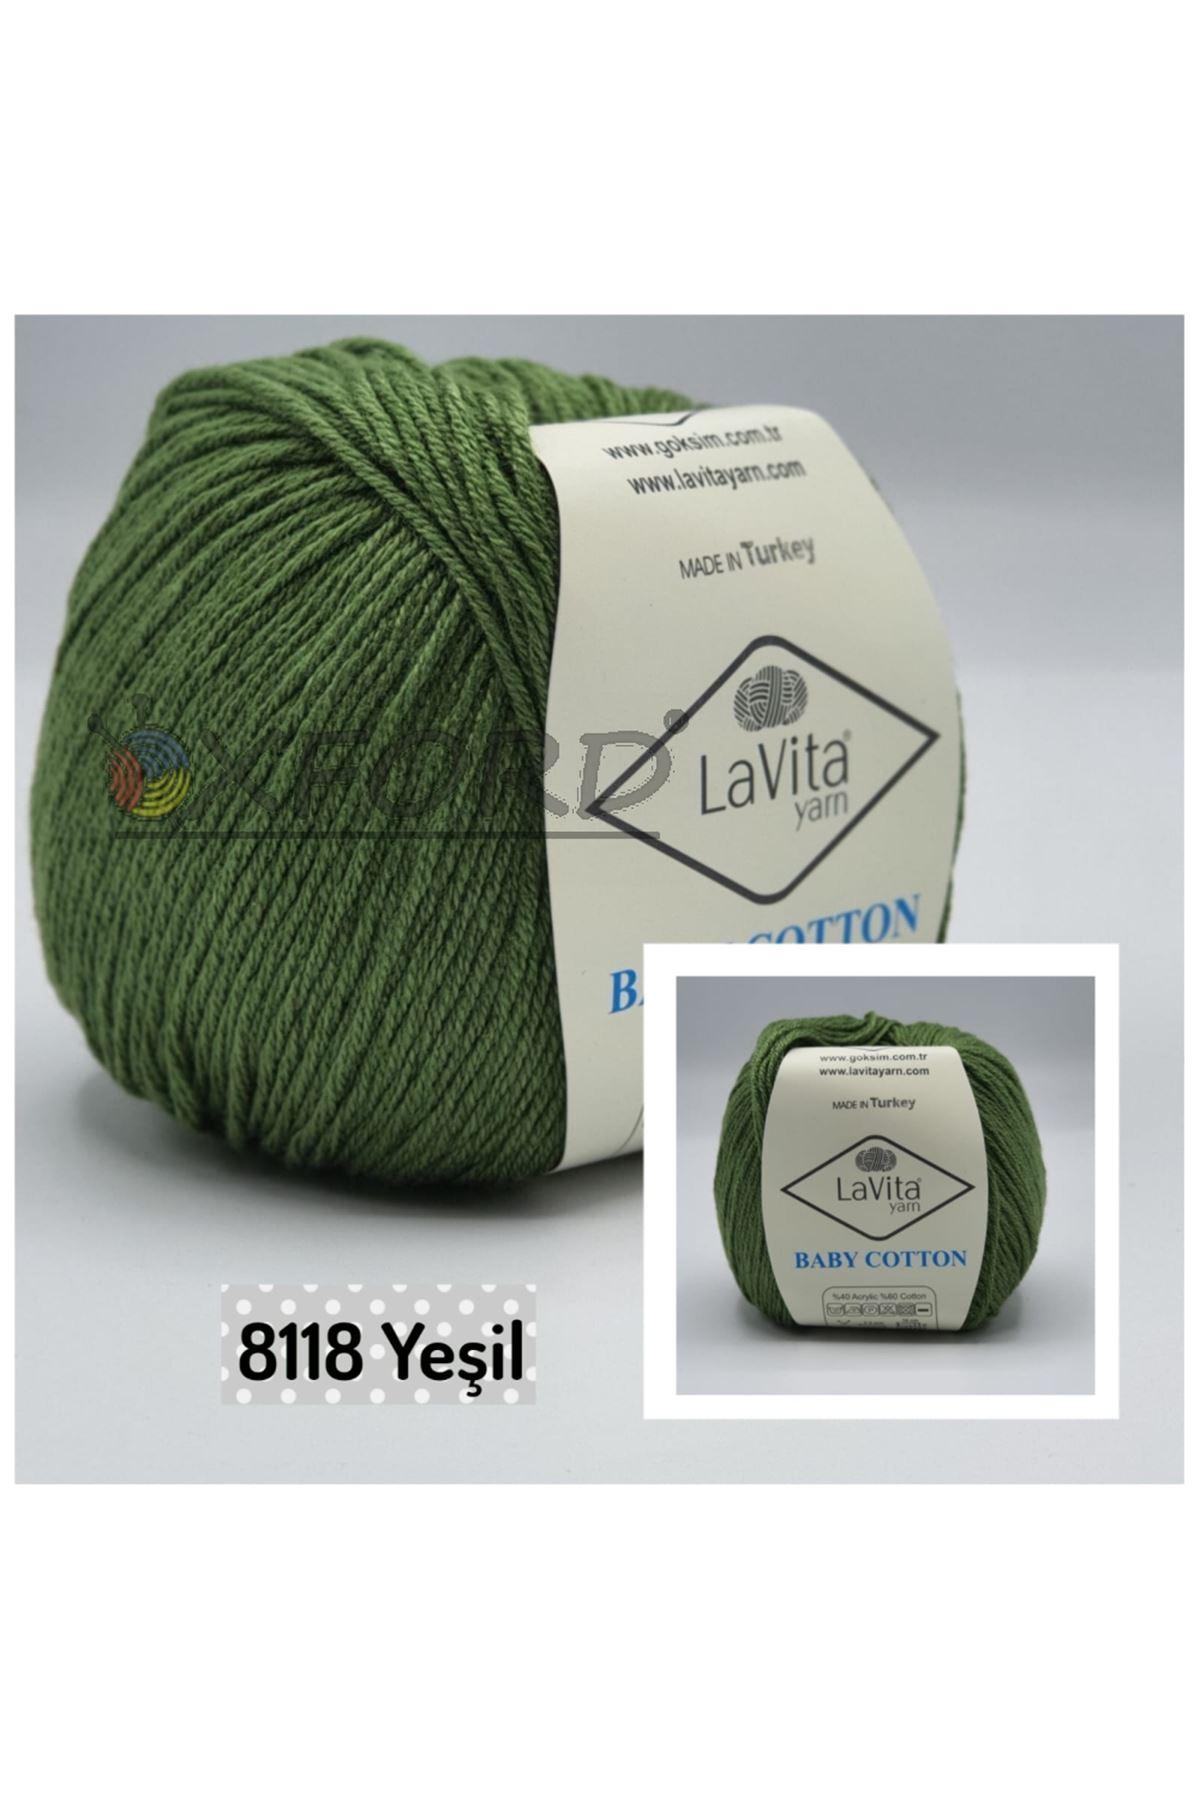 Lavita Baby Cotton 8118 Yeşil